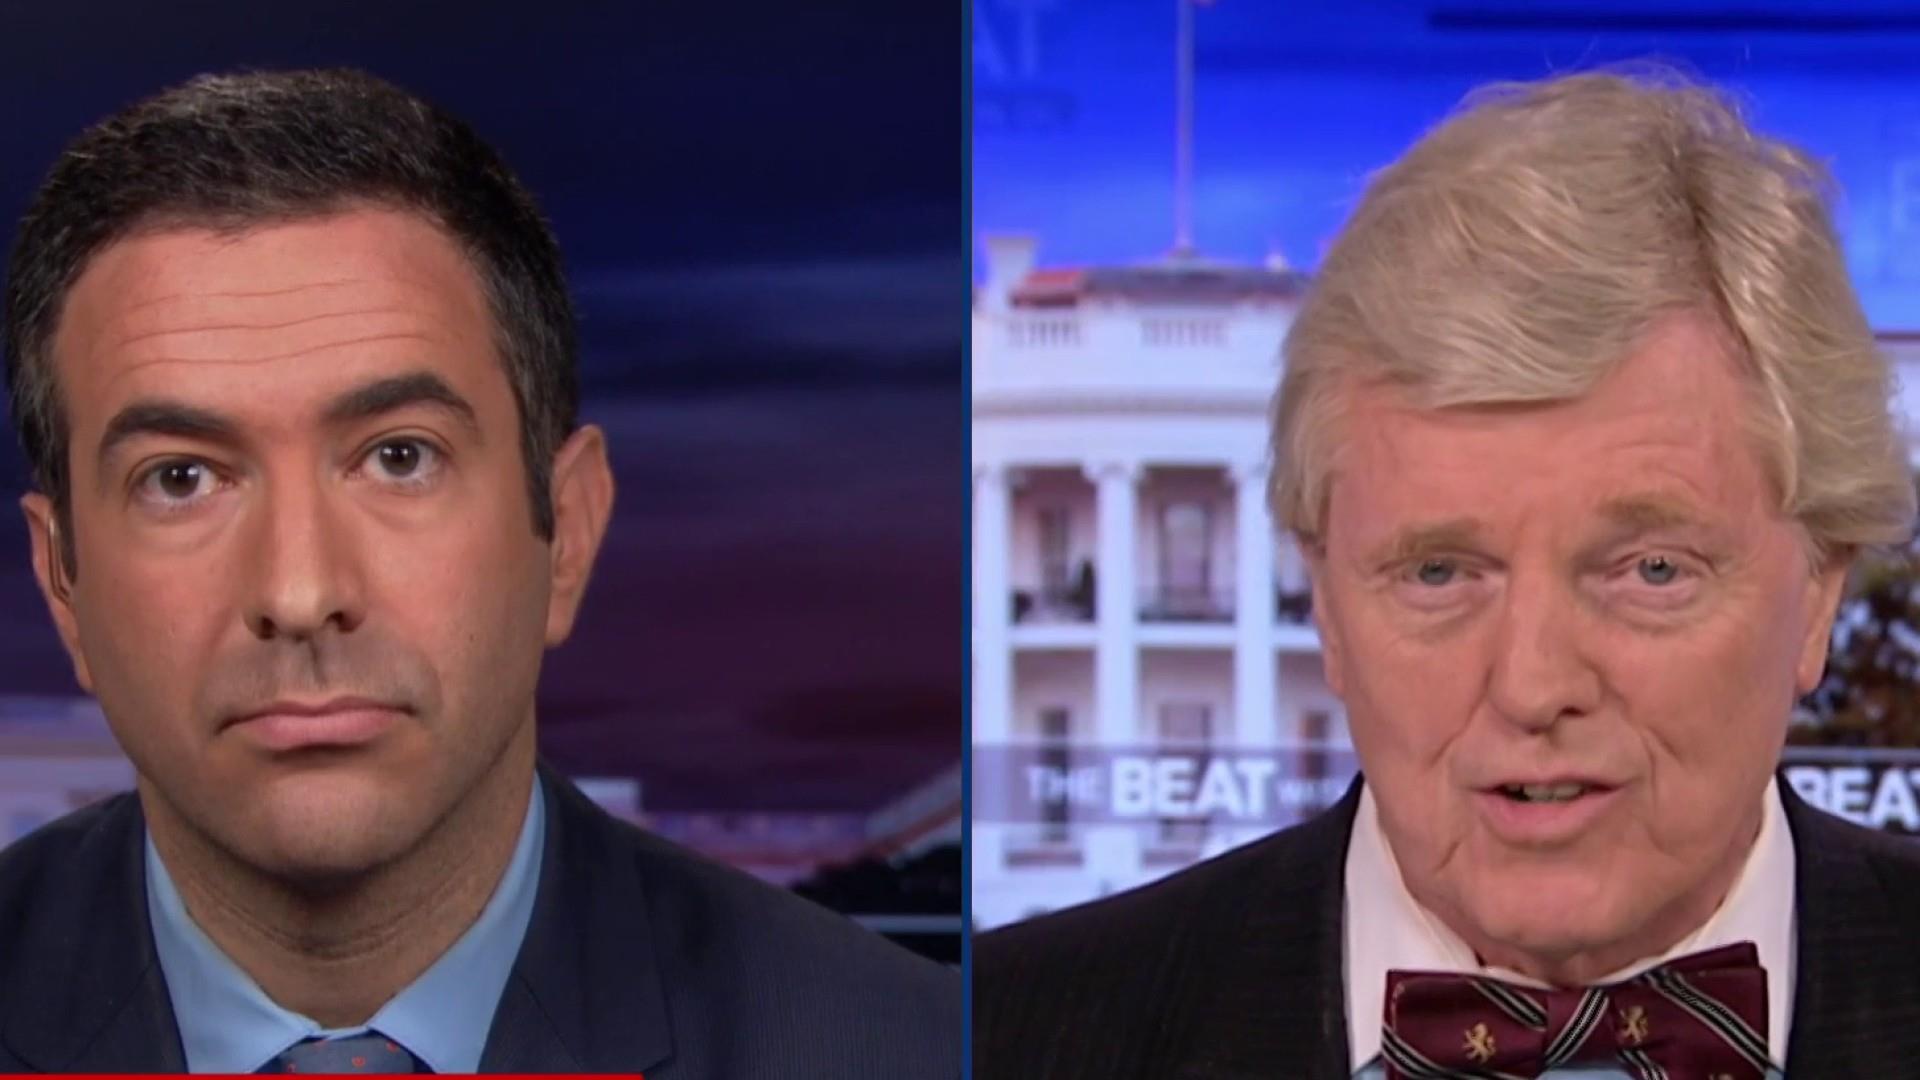 Prosecutor says Congress can jail Trump aids to make them talk